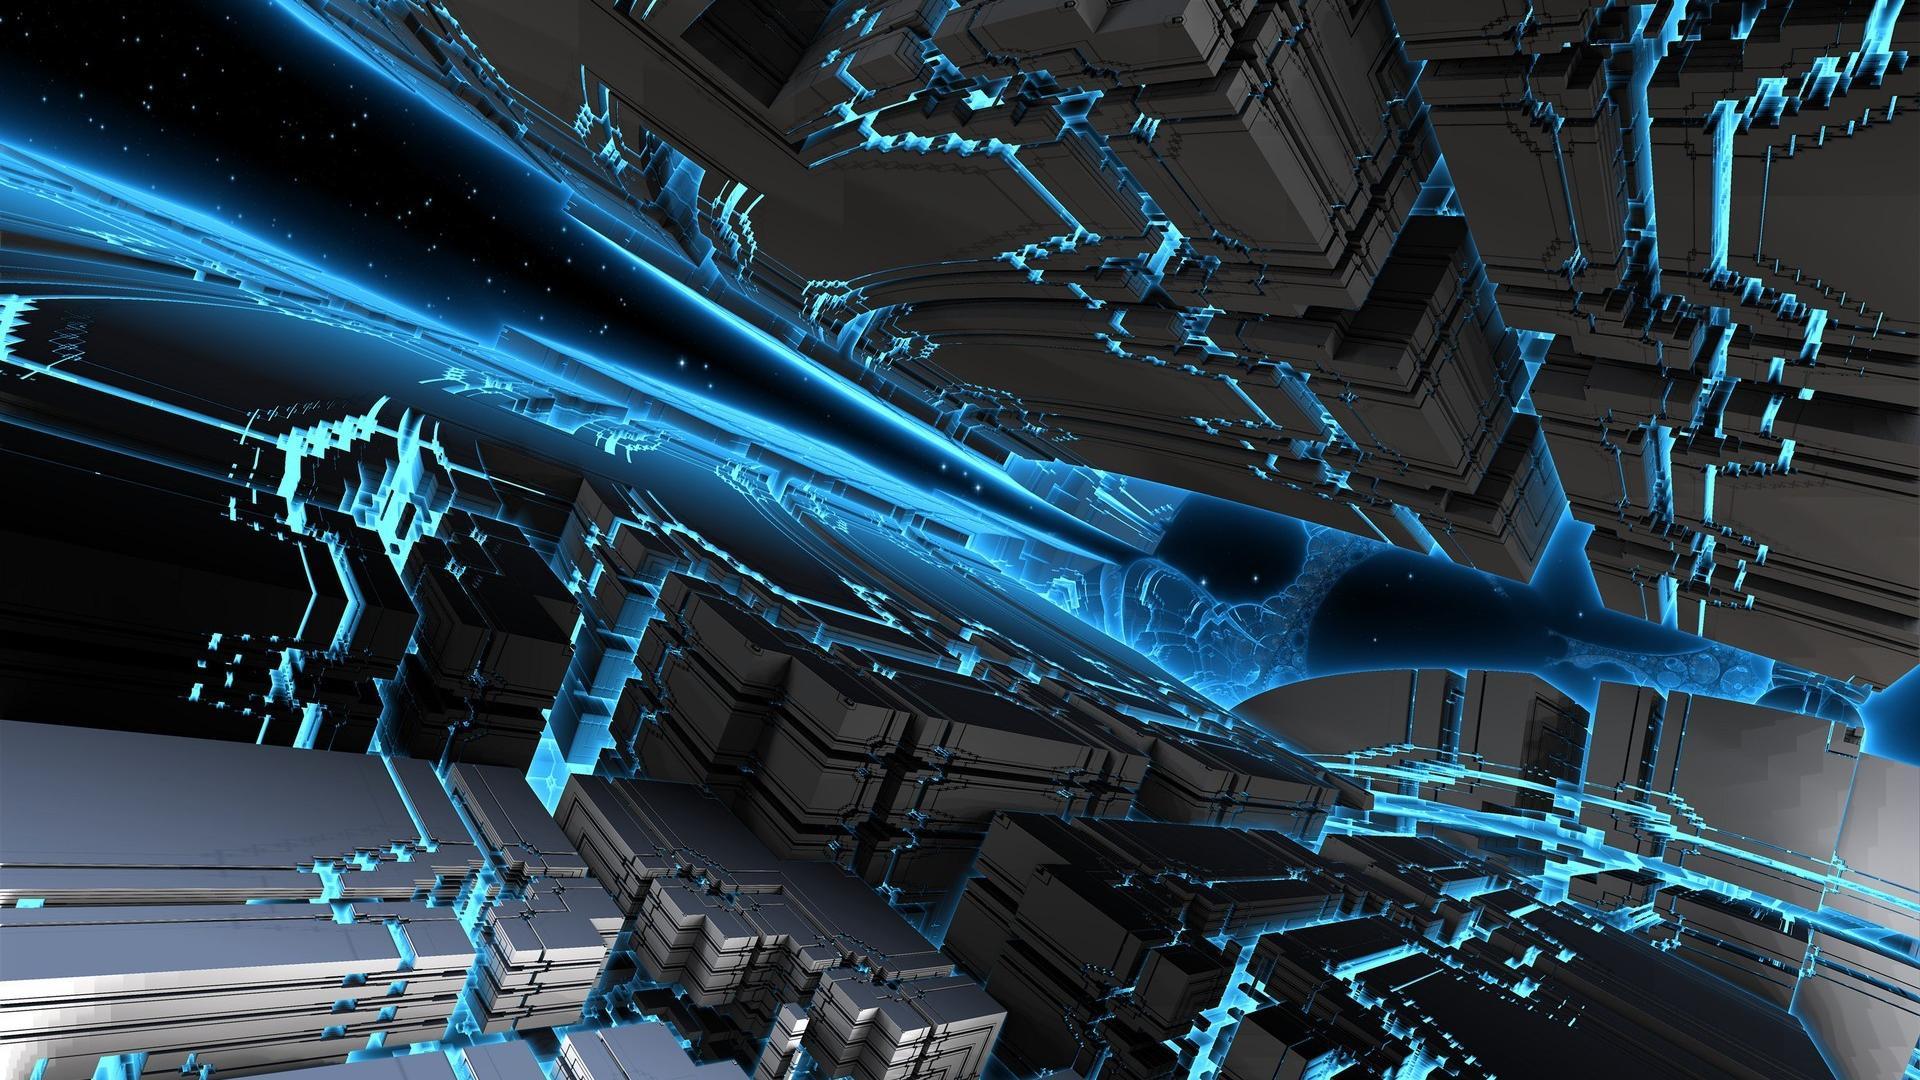 Cyberpunk wallpaper wallpapersafari - Cyber wallpaper ...